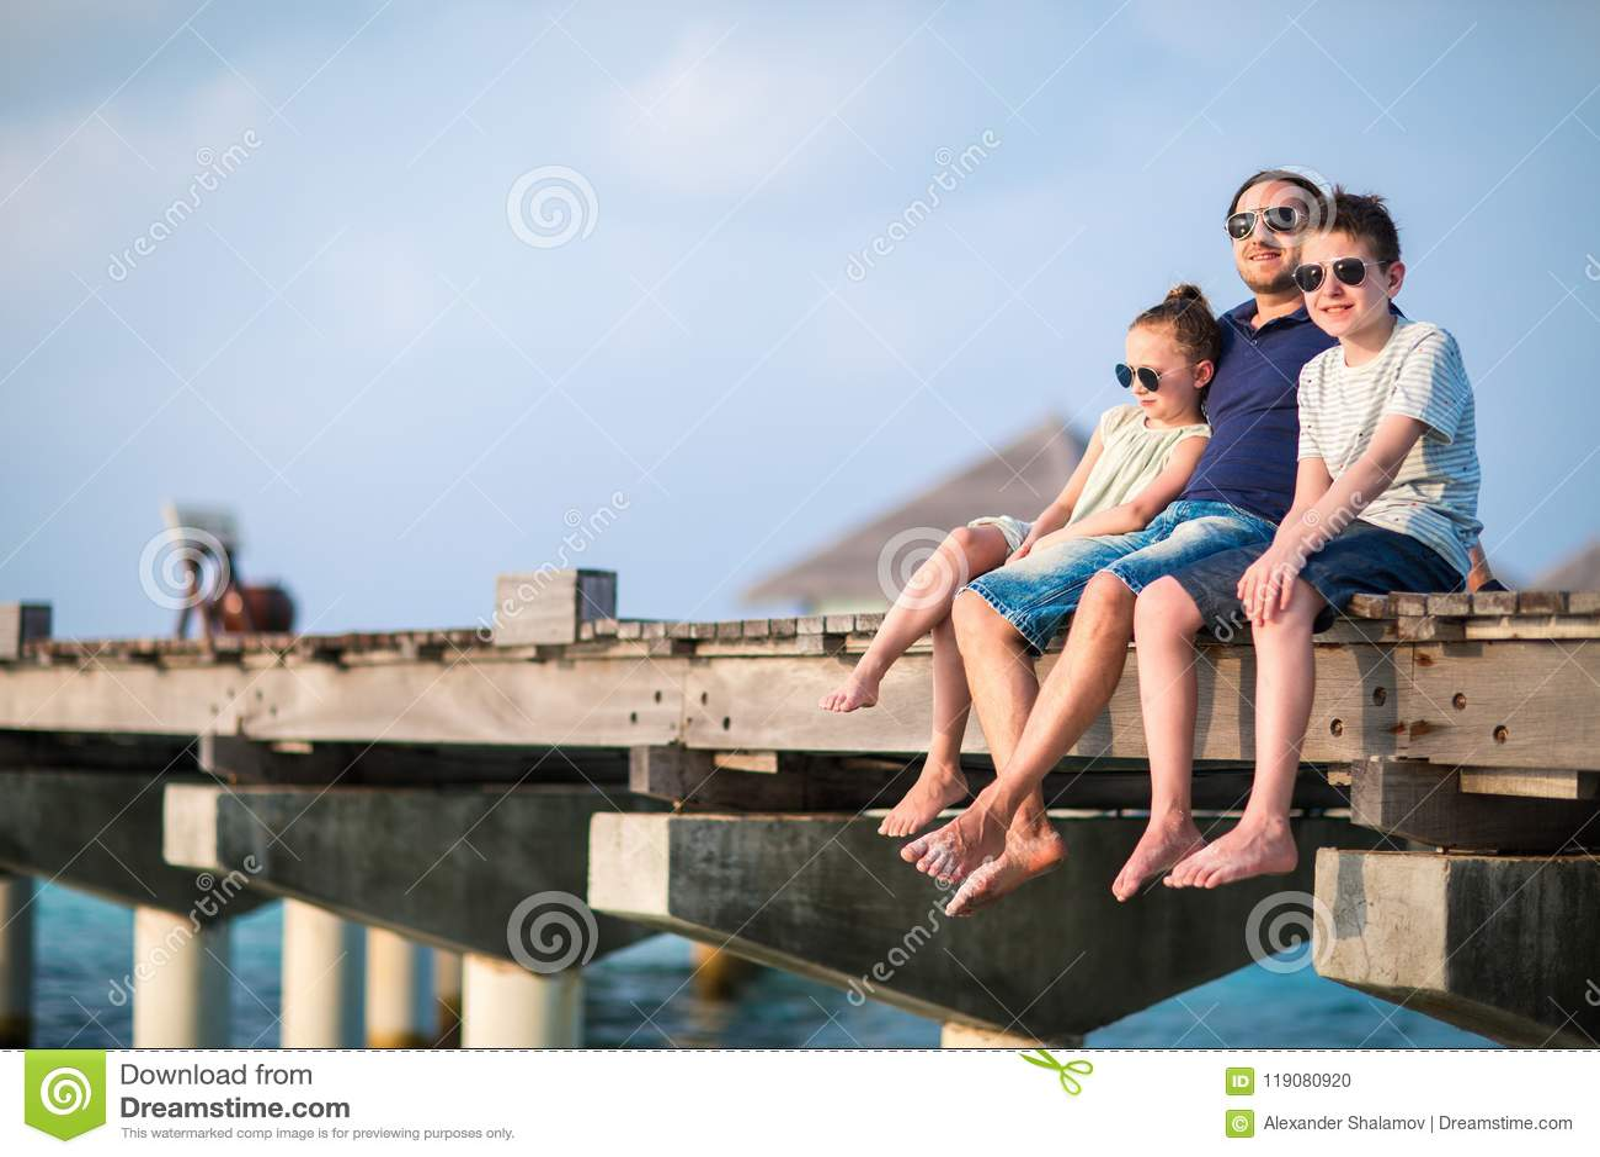 Familj på sommarsemester